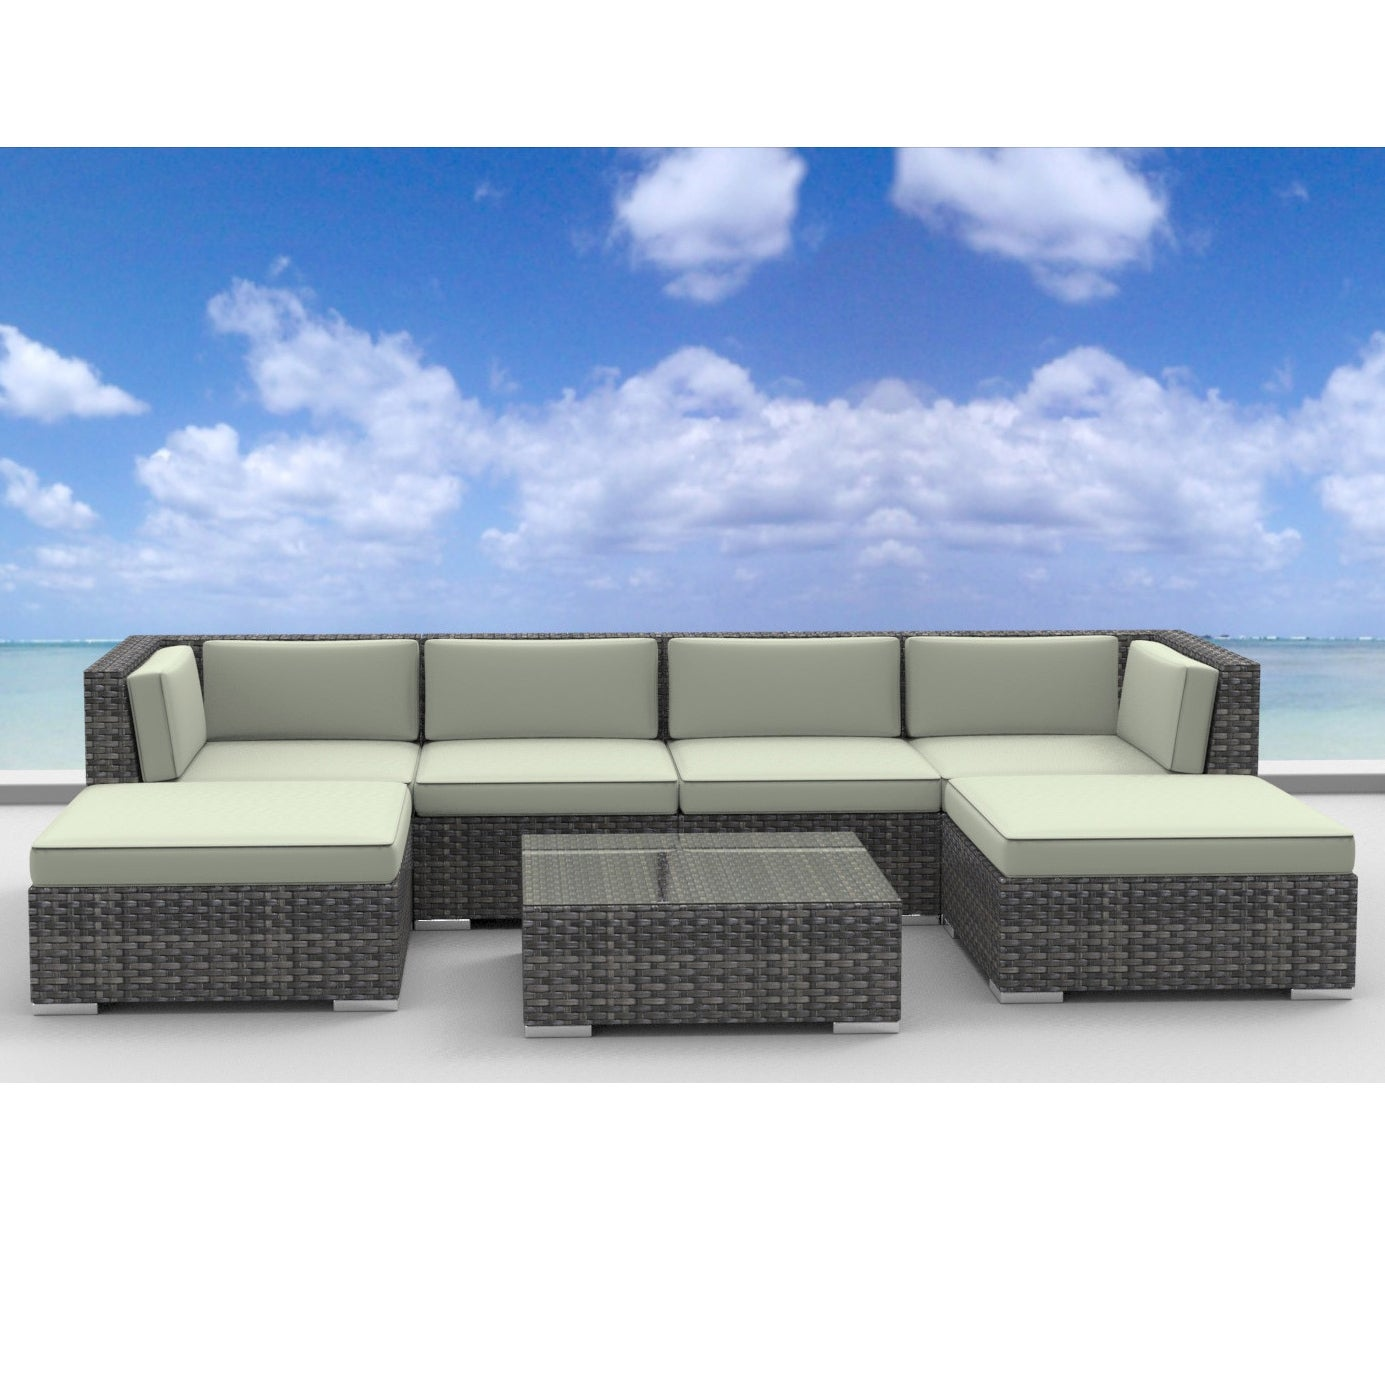 Urban Furnishing Maui Rattan 7 Piece Outdoor Sectional Sofa Patio Furniture Set Free Shipping Today 18890551